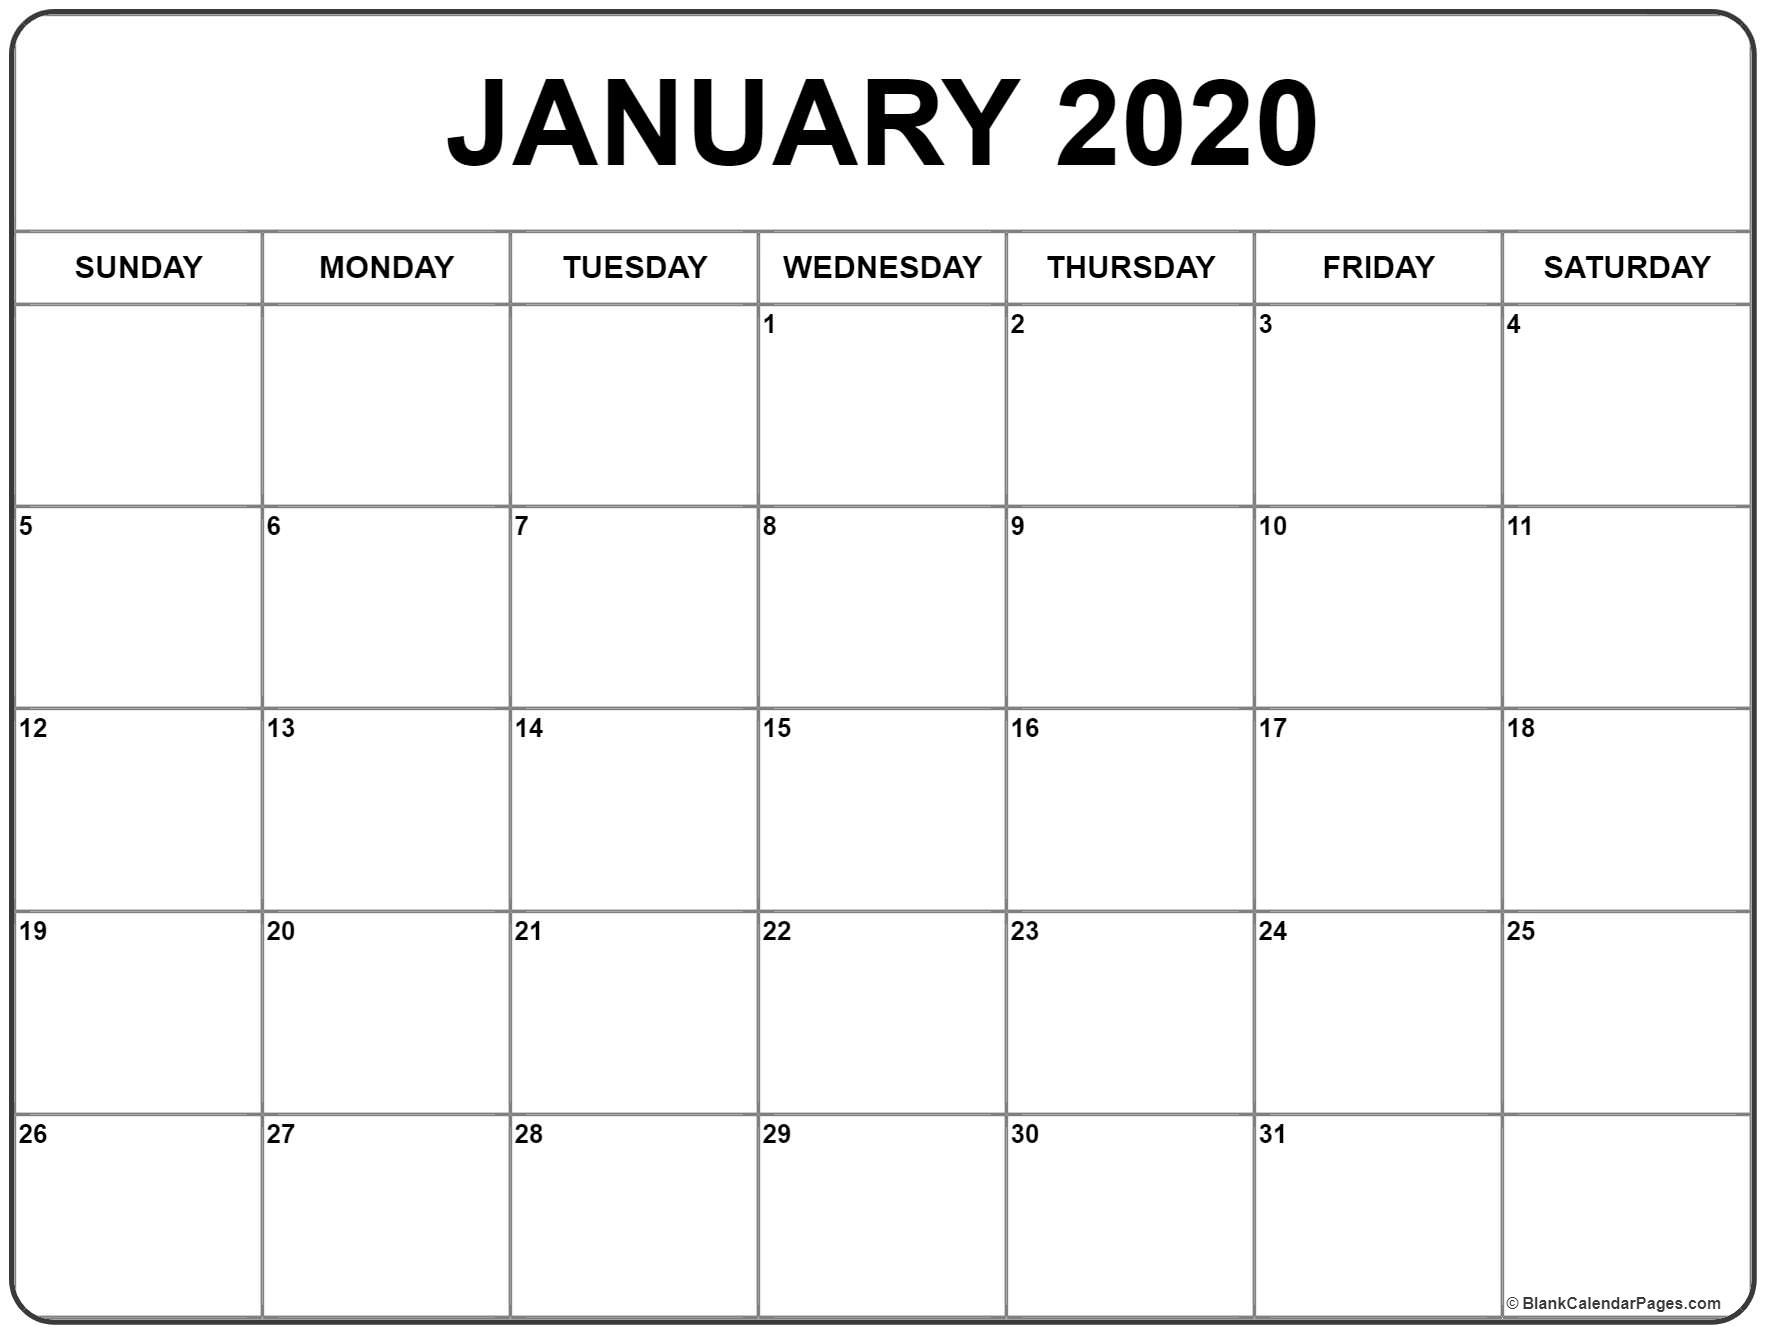 January 2020 Calendar | Free Printable Monthly Calendars-January 2020 School Calendar